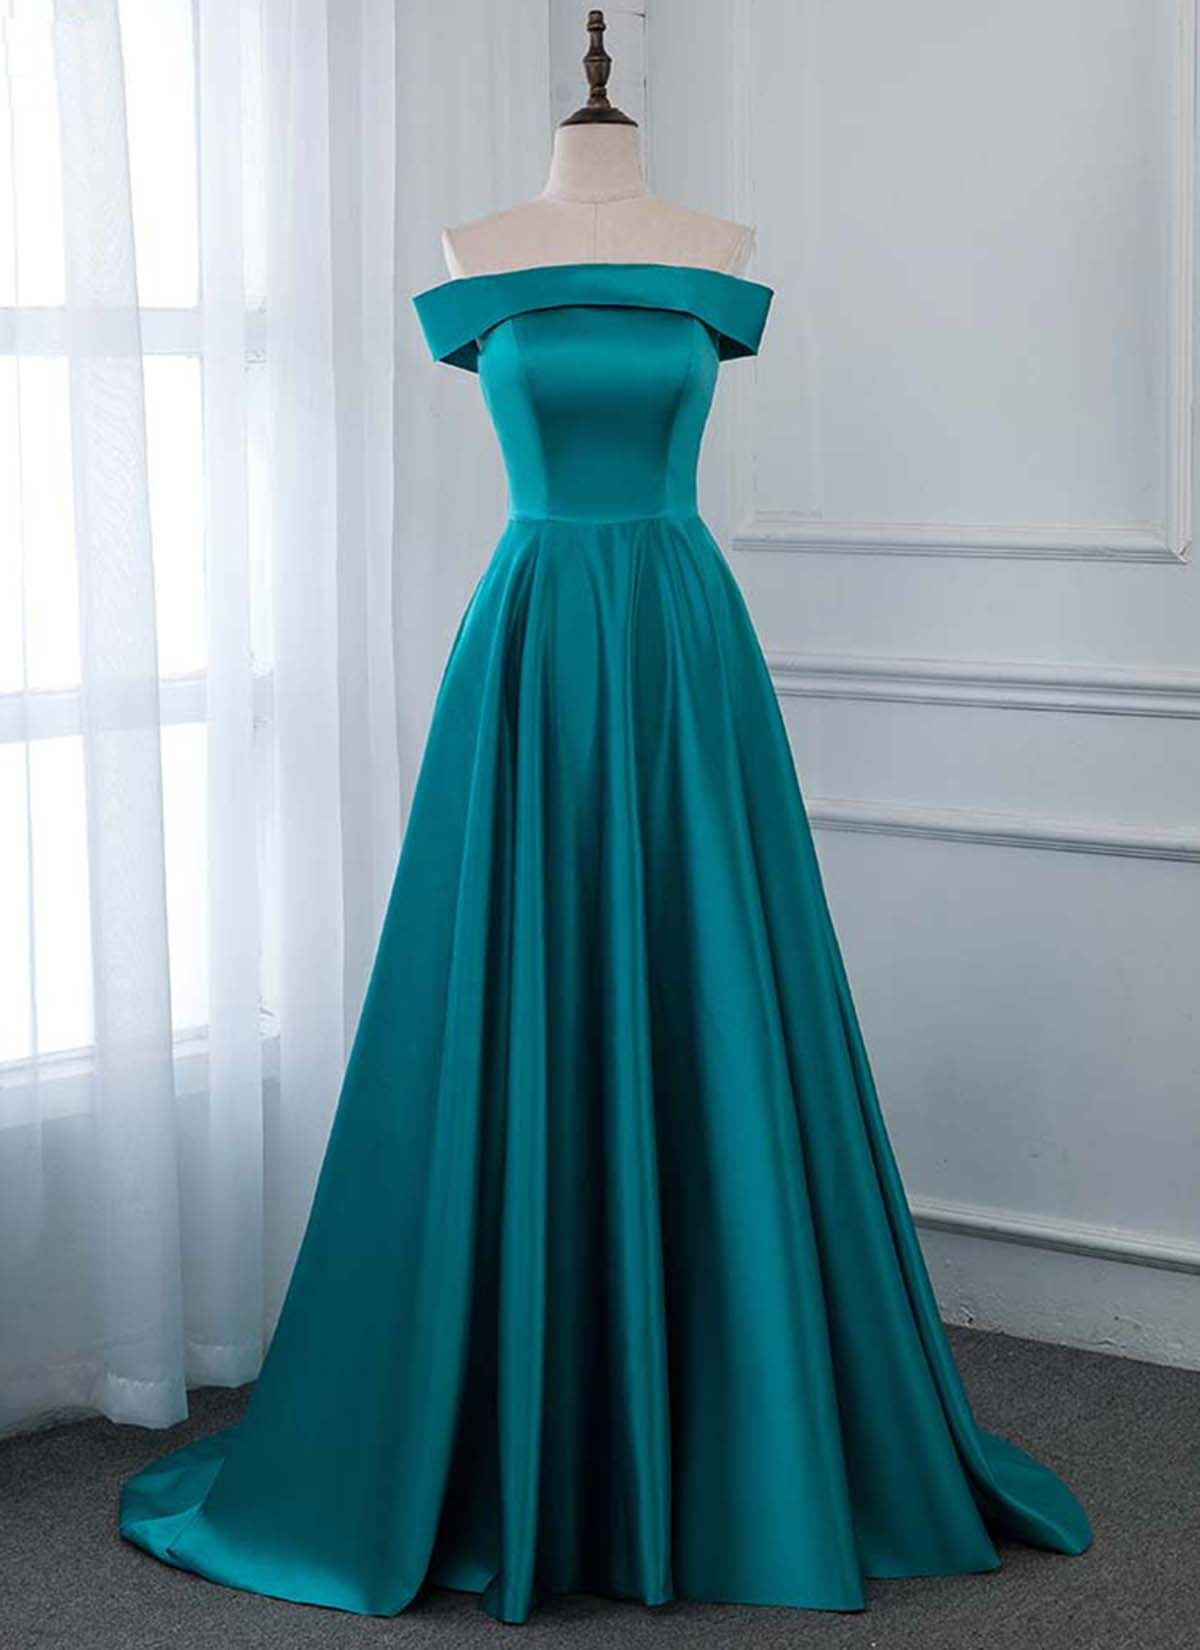 13 Luxurius Türkises Langes Kleid Galerie15 Einzigartig Türkises Langes Kleid Spezialgebiet